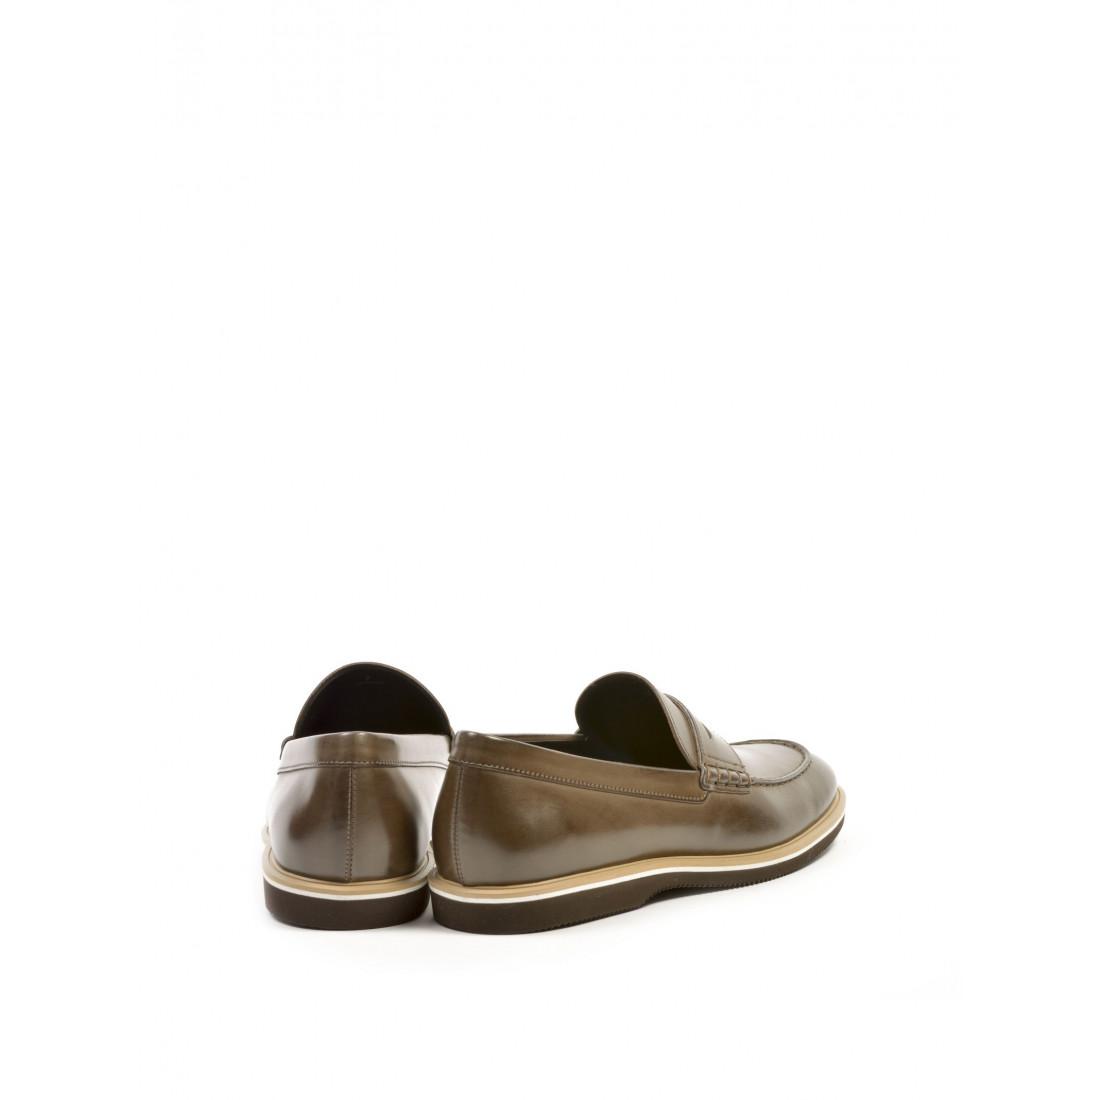 loafers man hogan hxm2620r7308a1s808 314